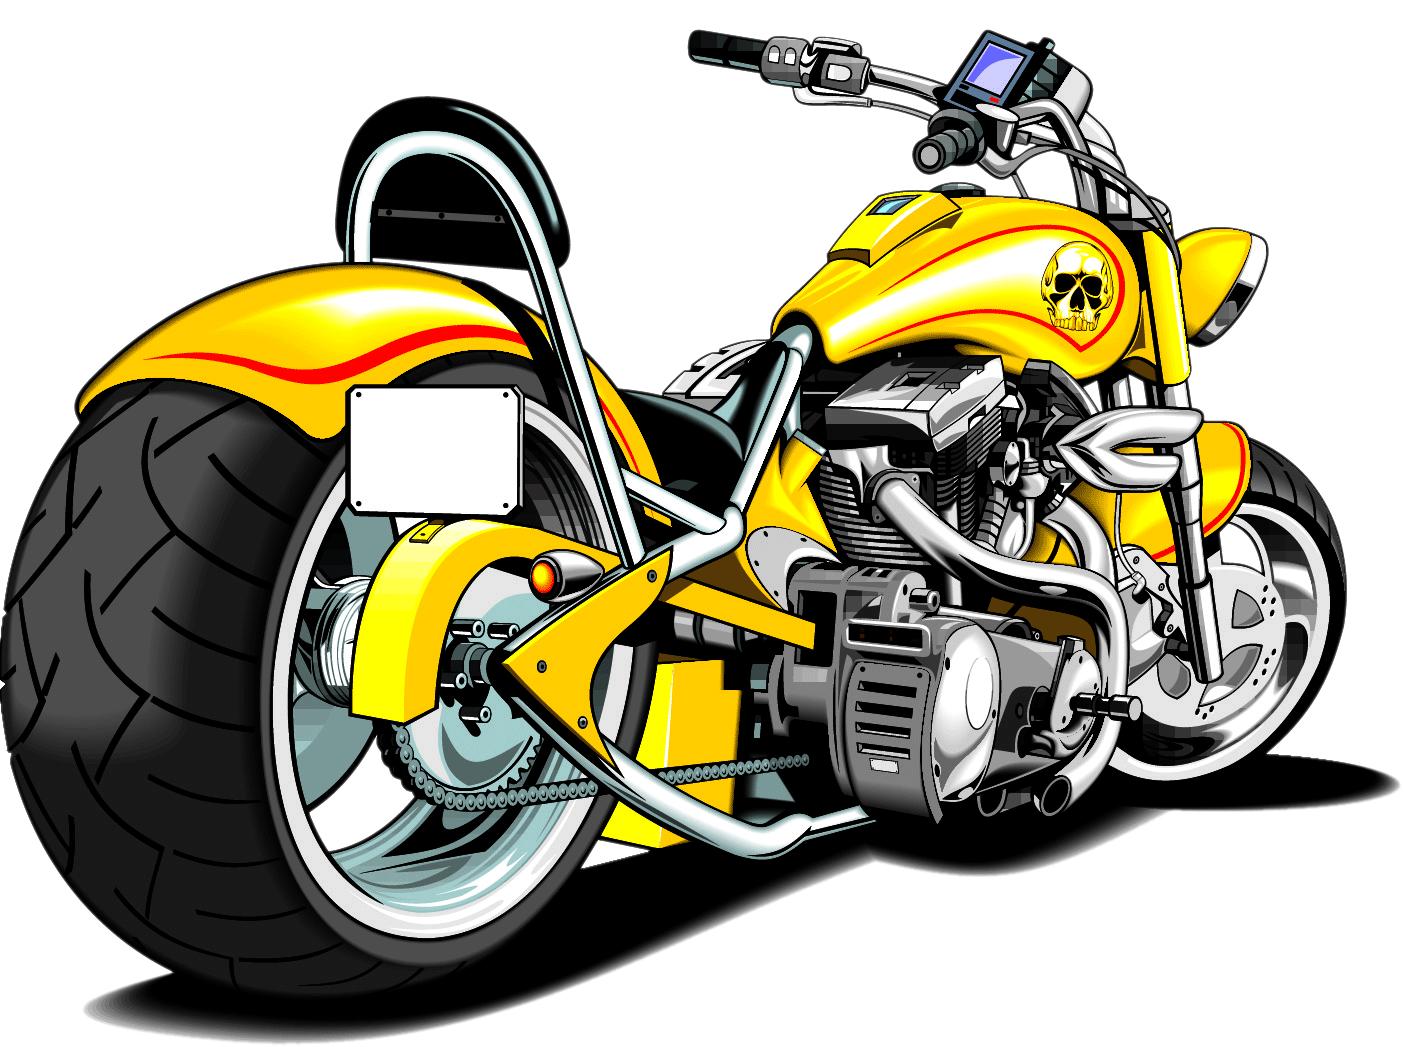 free motorcycle without  Harley Davidson PNG Image - PurePNG | Free transparent CC0 PNG Image ...